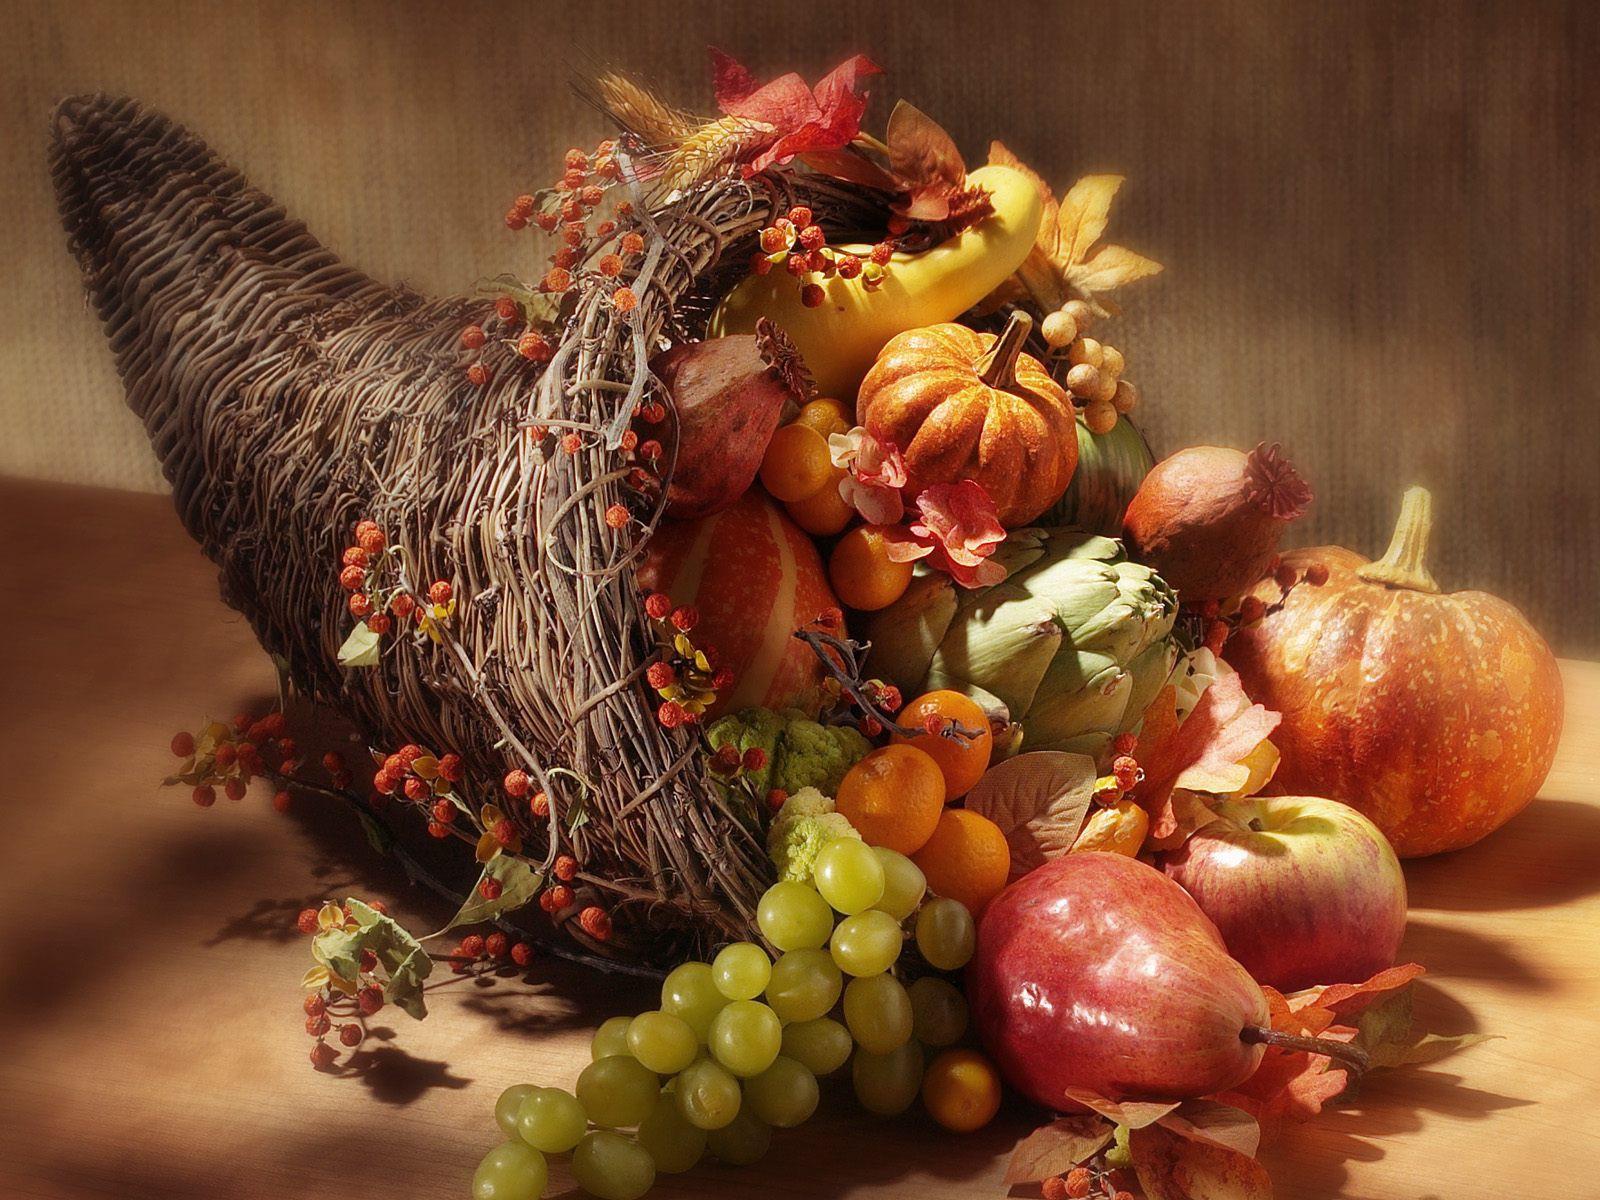 Cornucopia Feast